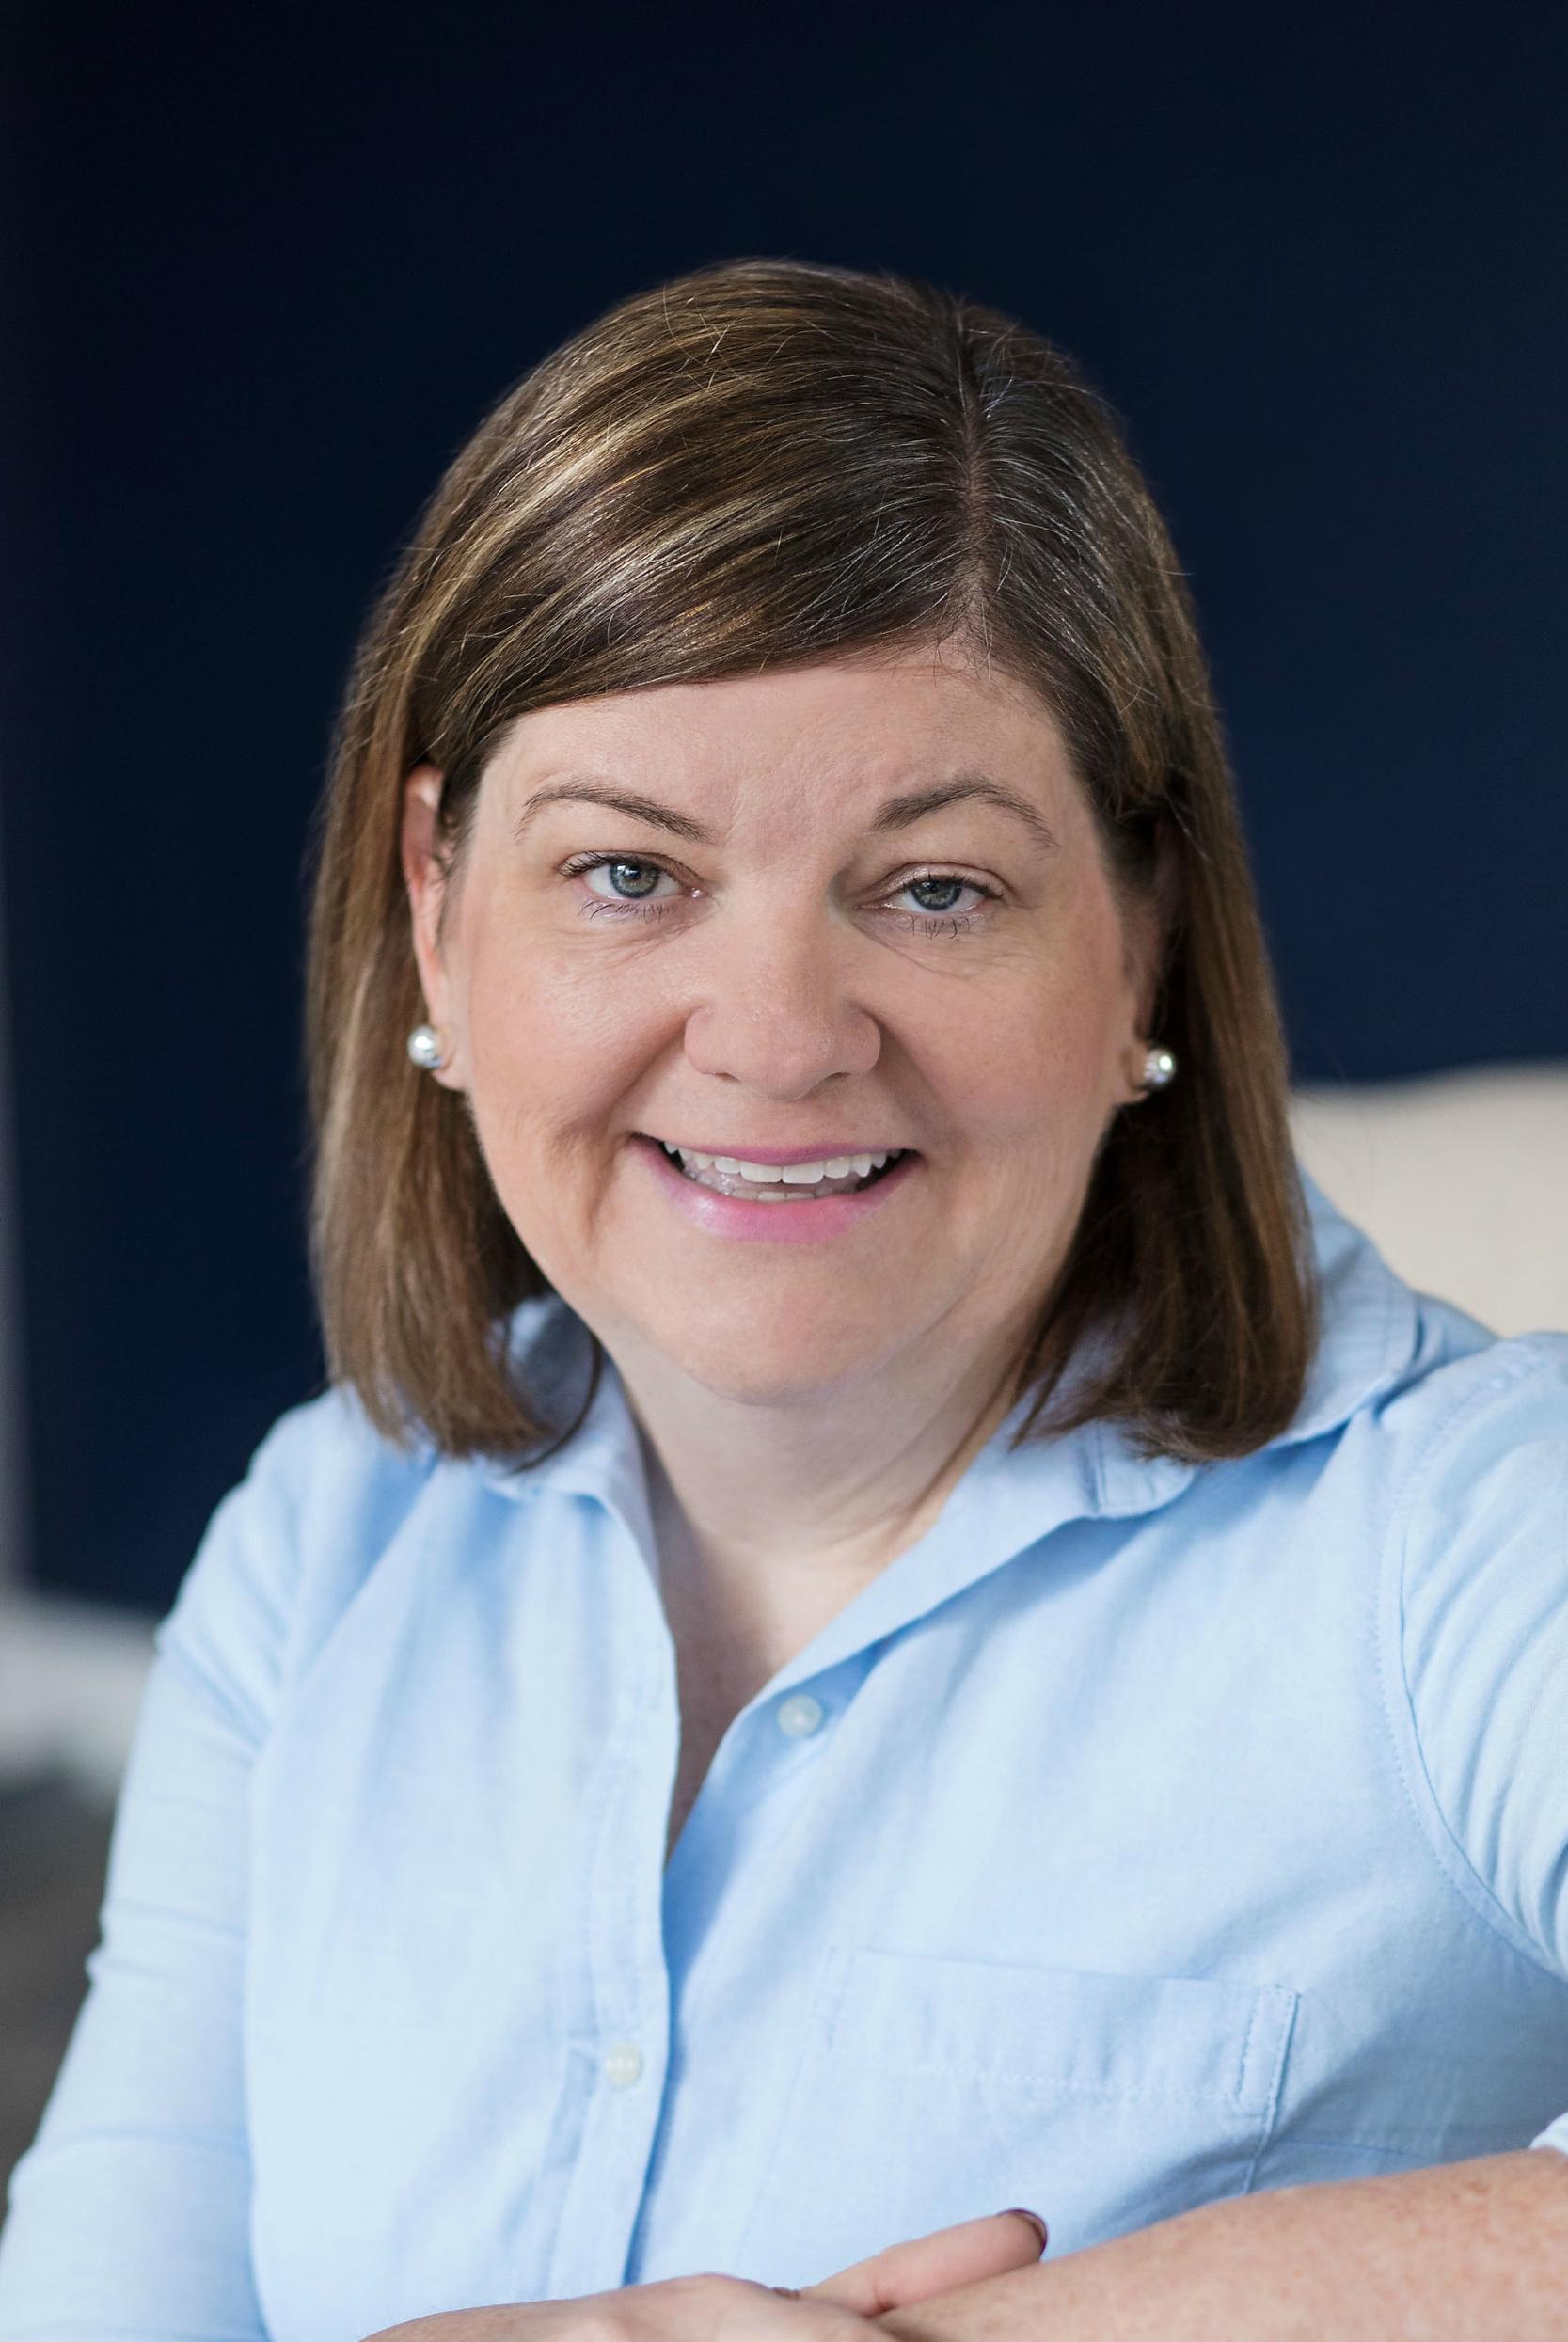 Maggie Page, Hearing Instrument Specialist